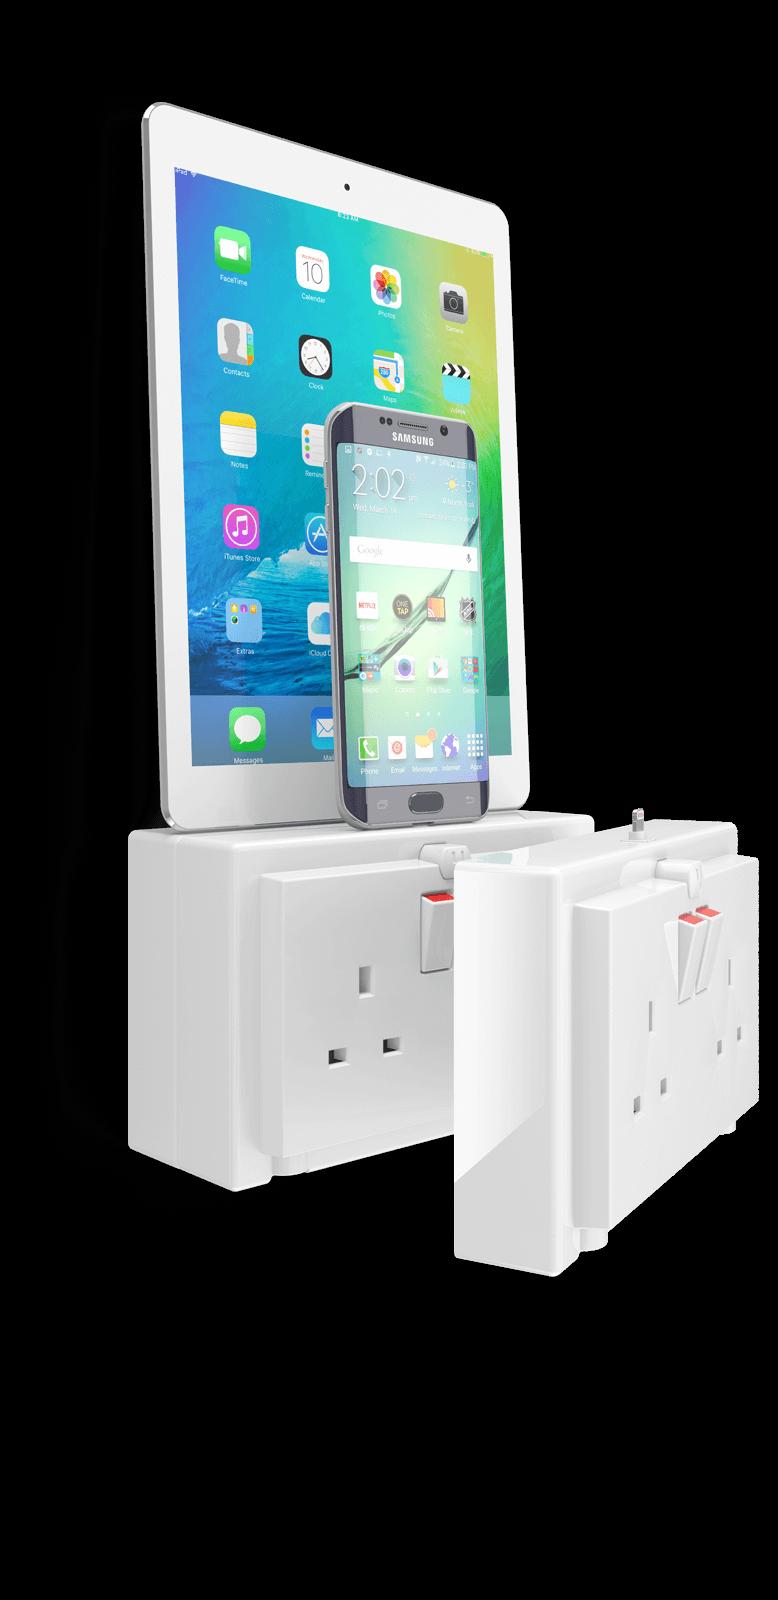 thingcharger Multi Ladegerät Tablet iPad Smartphone-innovative Geschenksideen